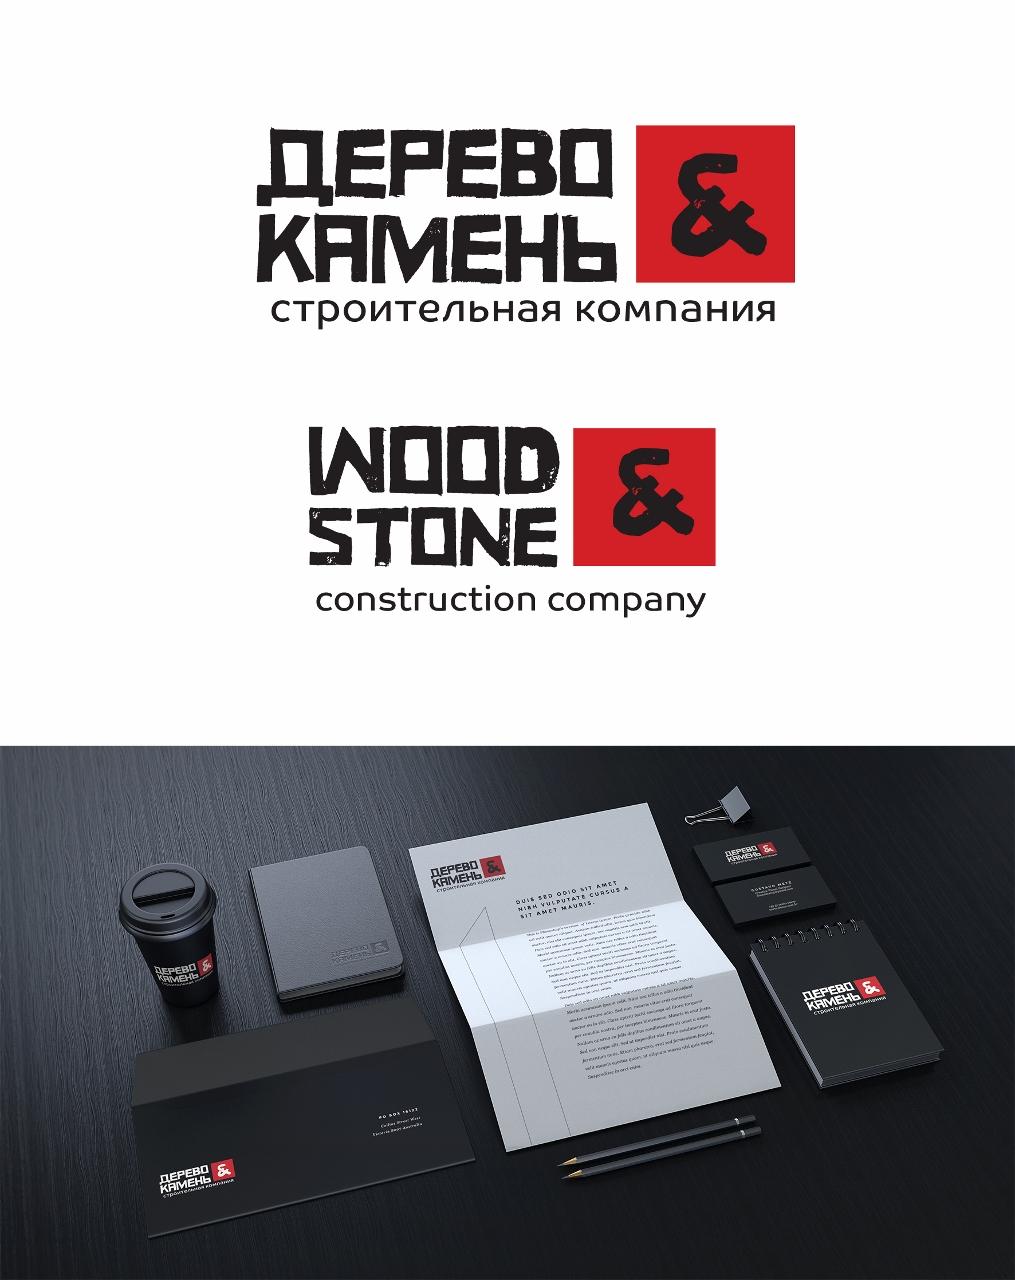 Логотип и Фирменный стиль фото f_26854949fd6dae75.jpg